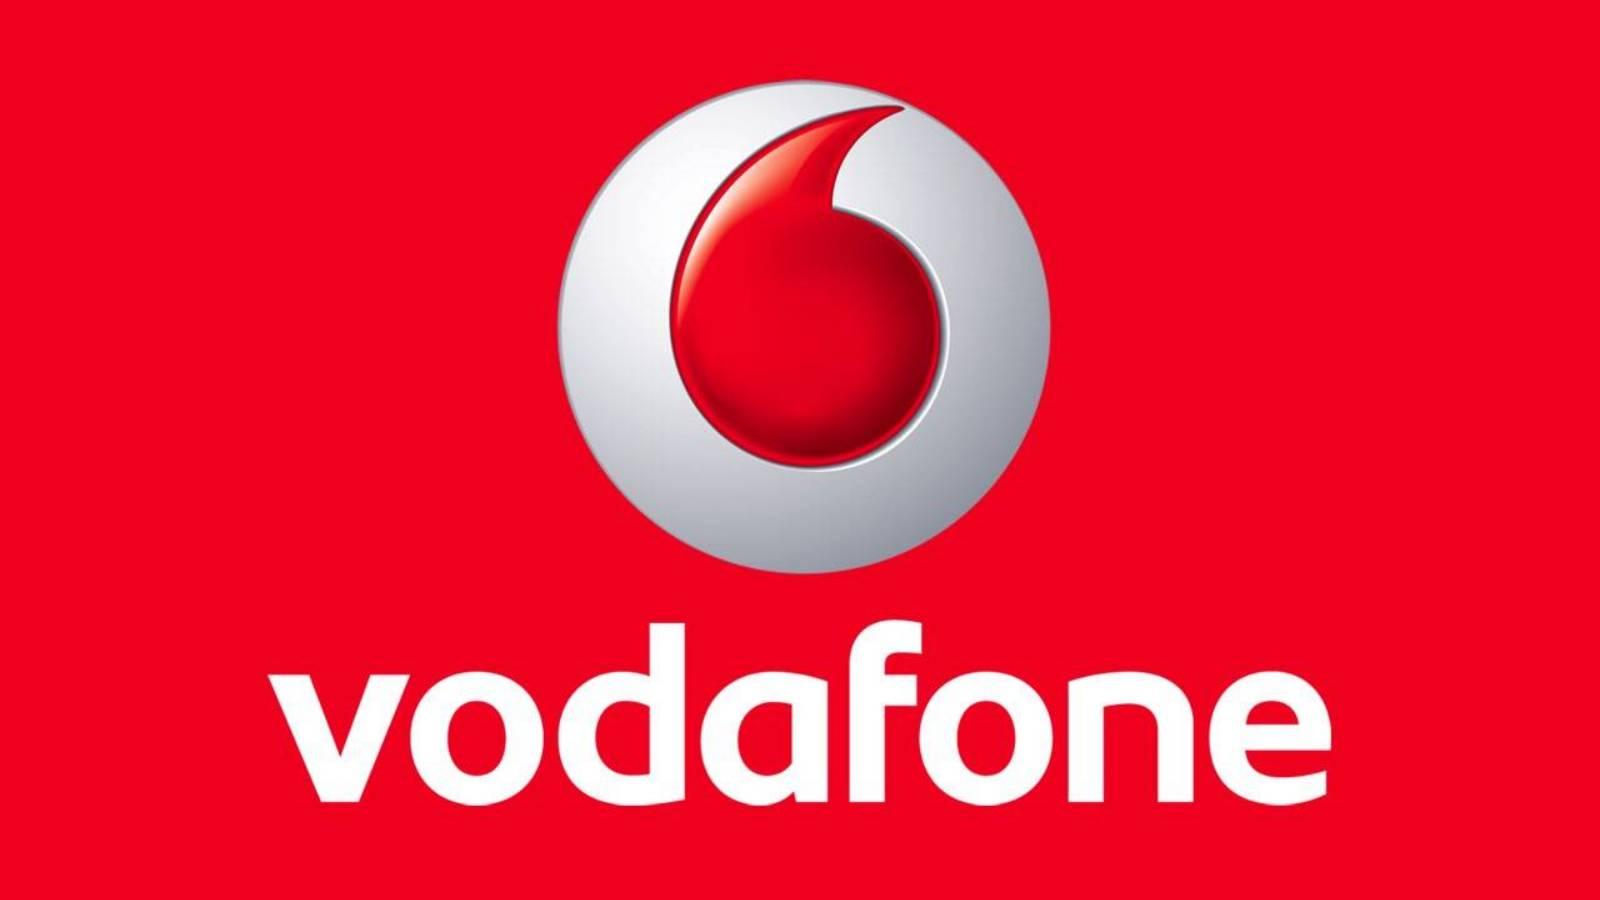 Vodafone fraude